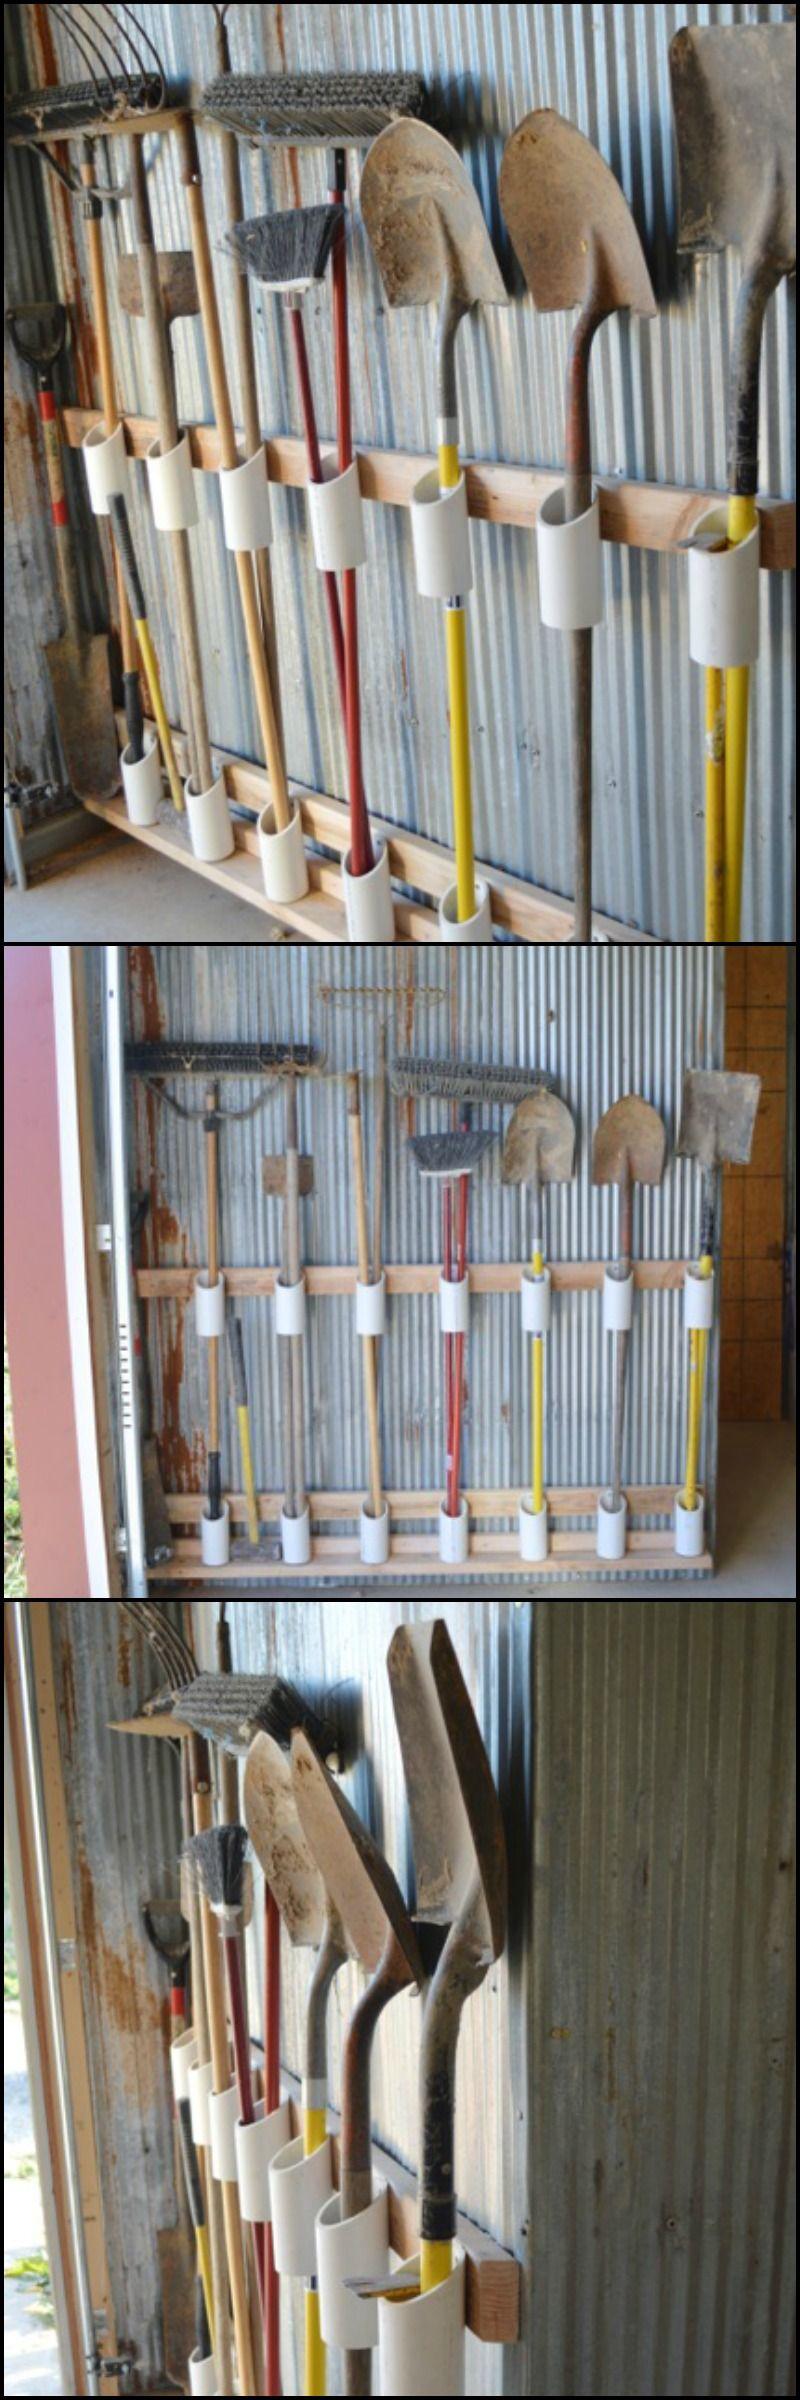 Build A Yard Tool Organizer From Pvc Storage Ideas